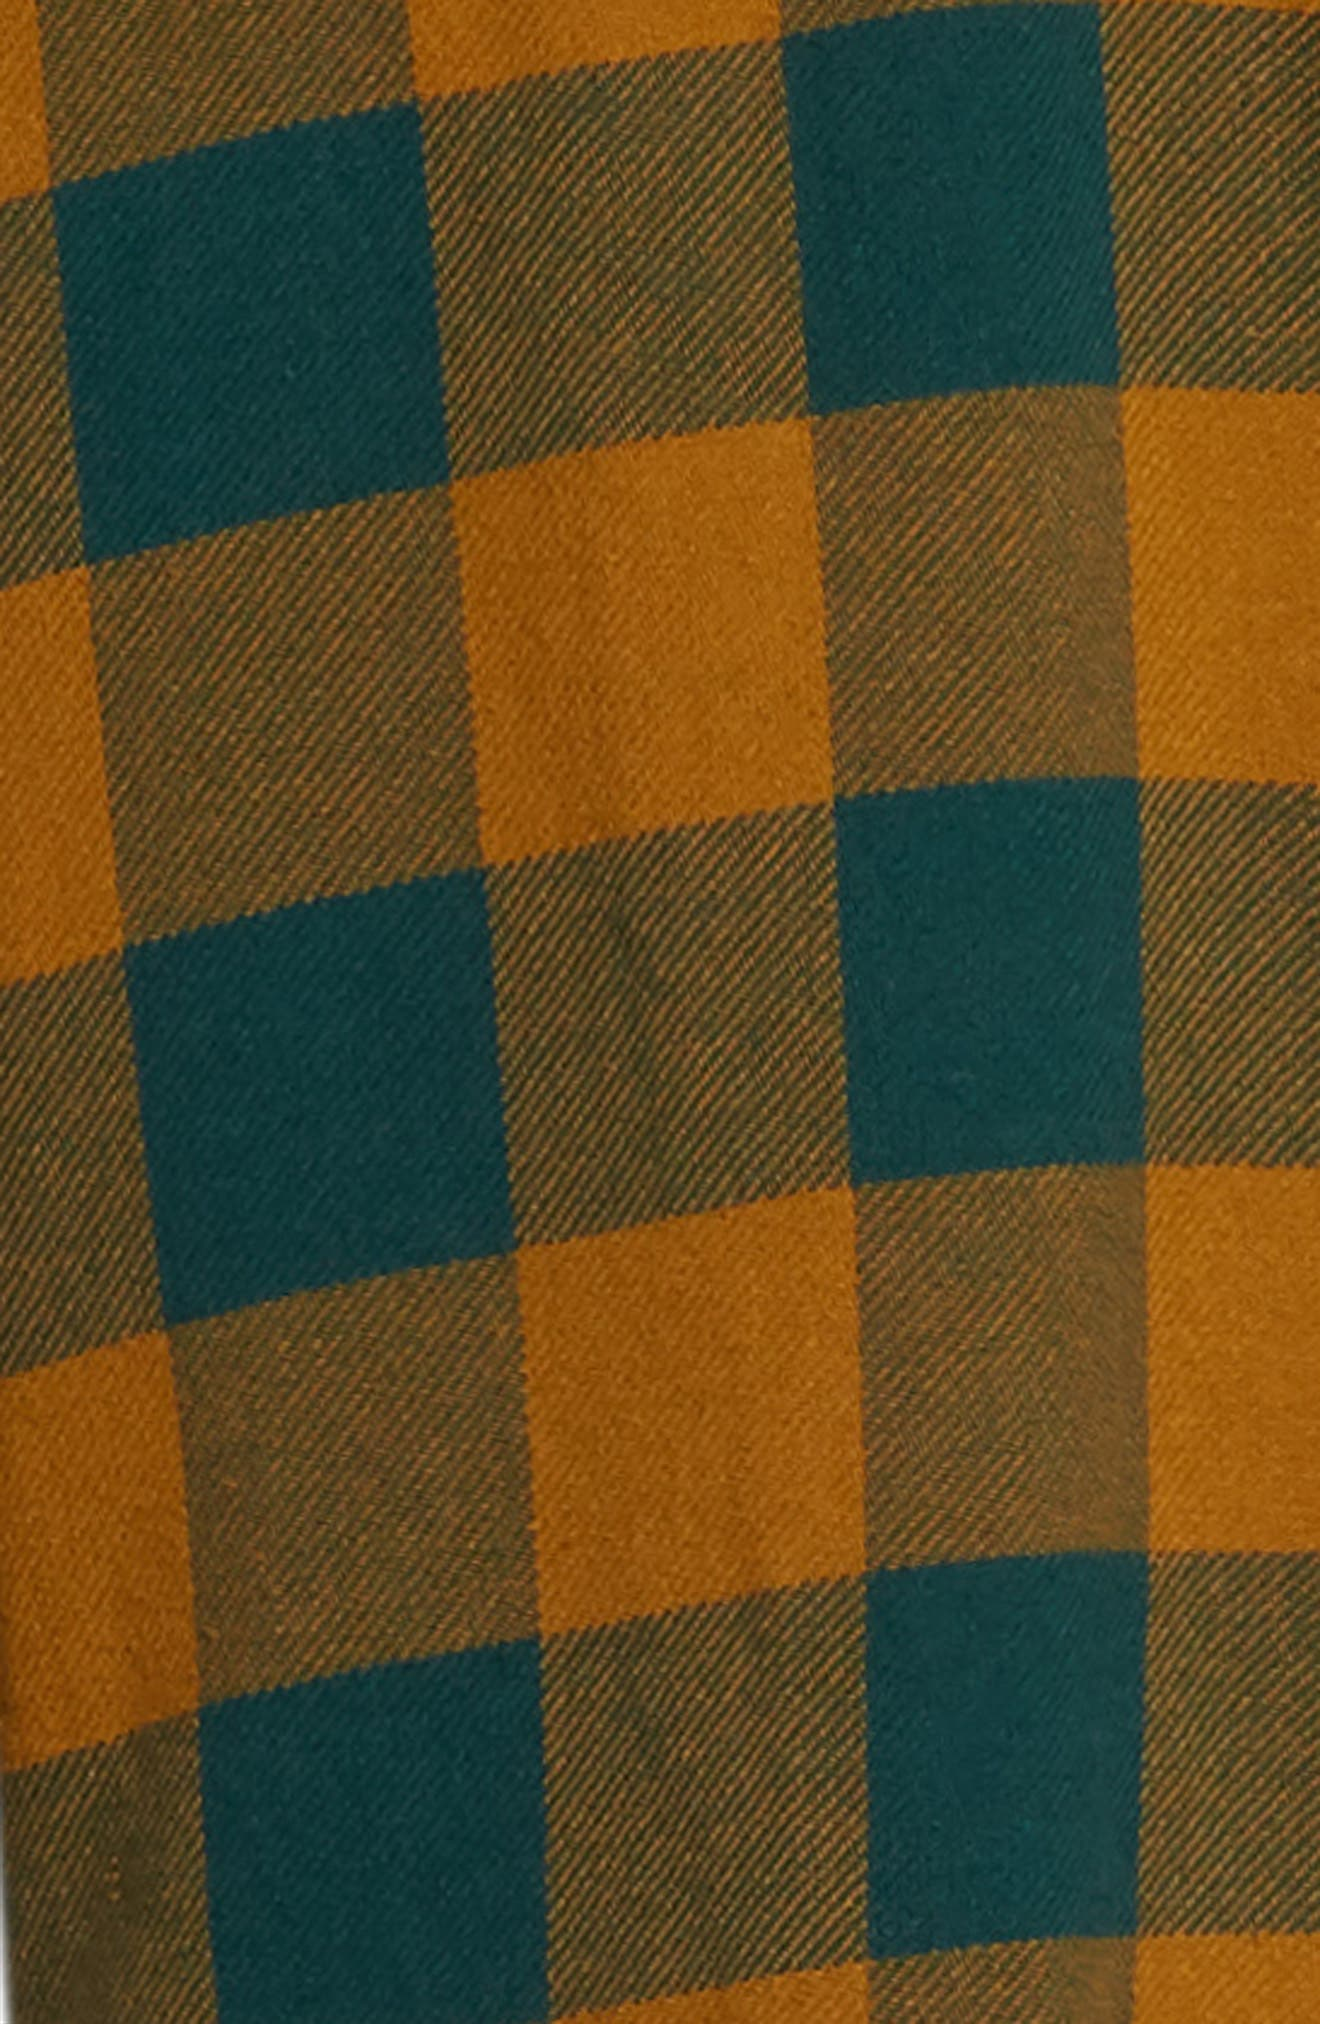 Vedder Buffalo Plaid Flannel Shirt,                             Alternate thumbnail 6, color,                             DARK TEAL MULTI